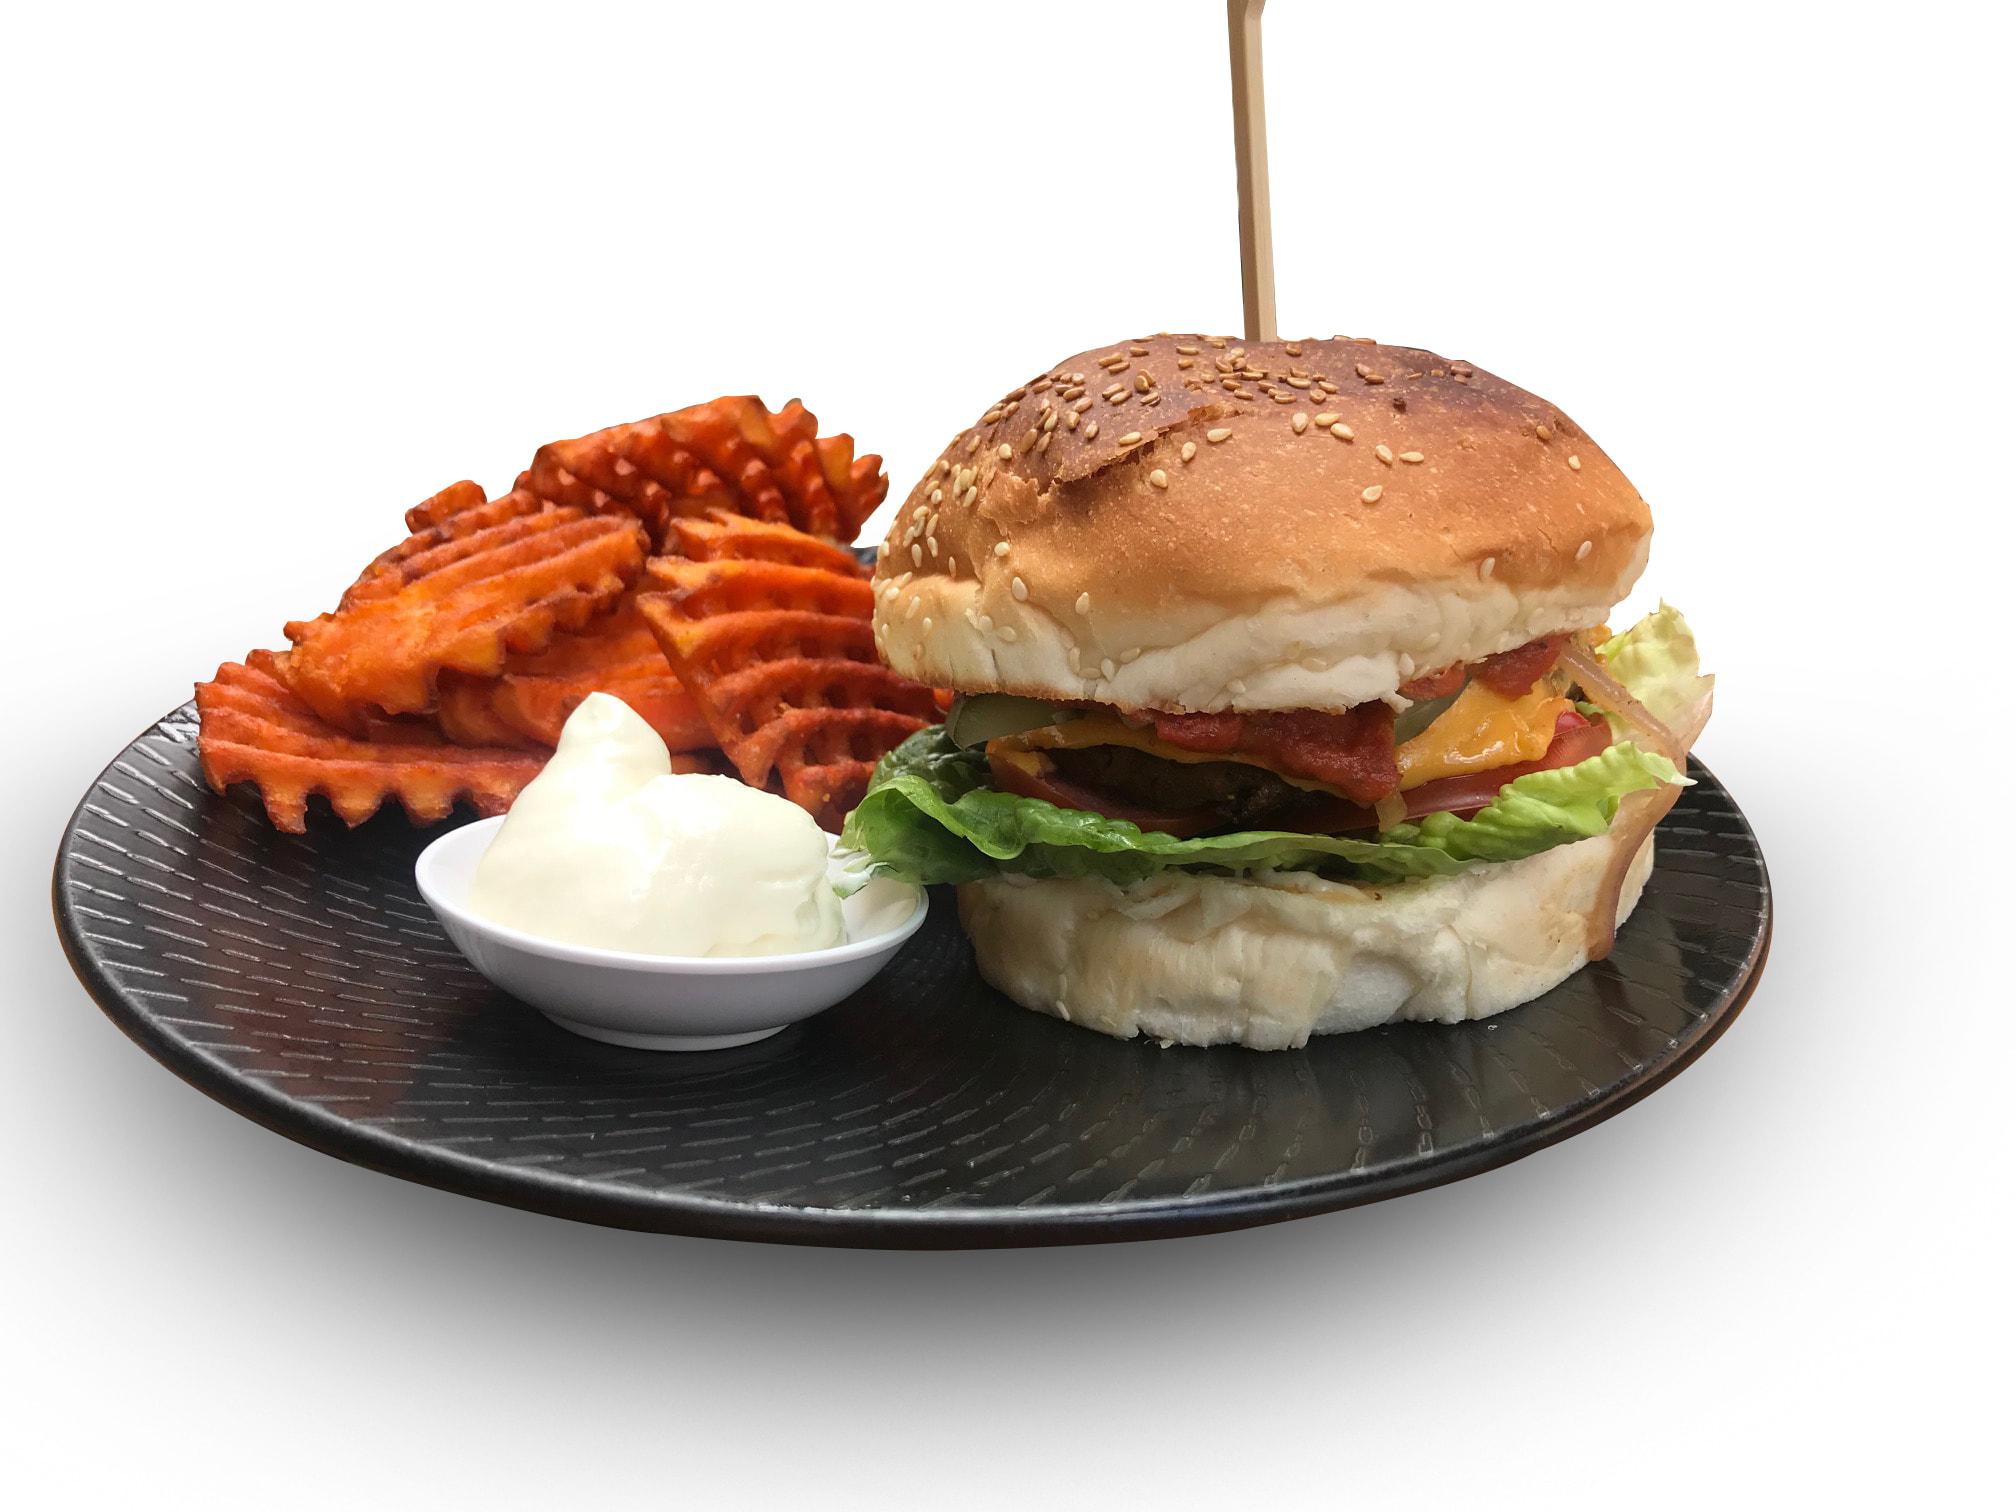 Beef-Less Burger & Fries